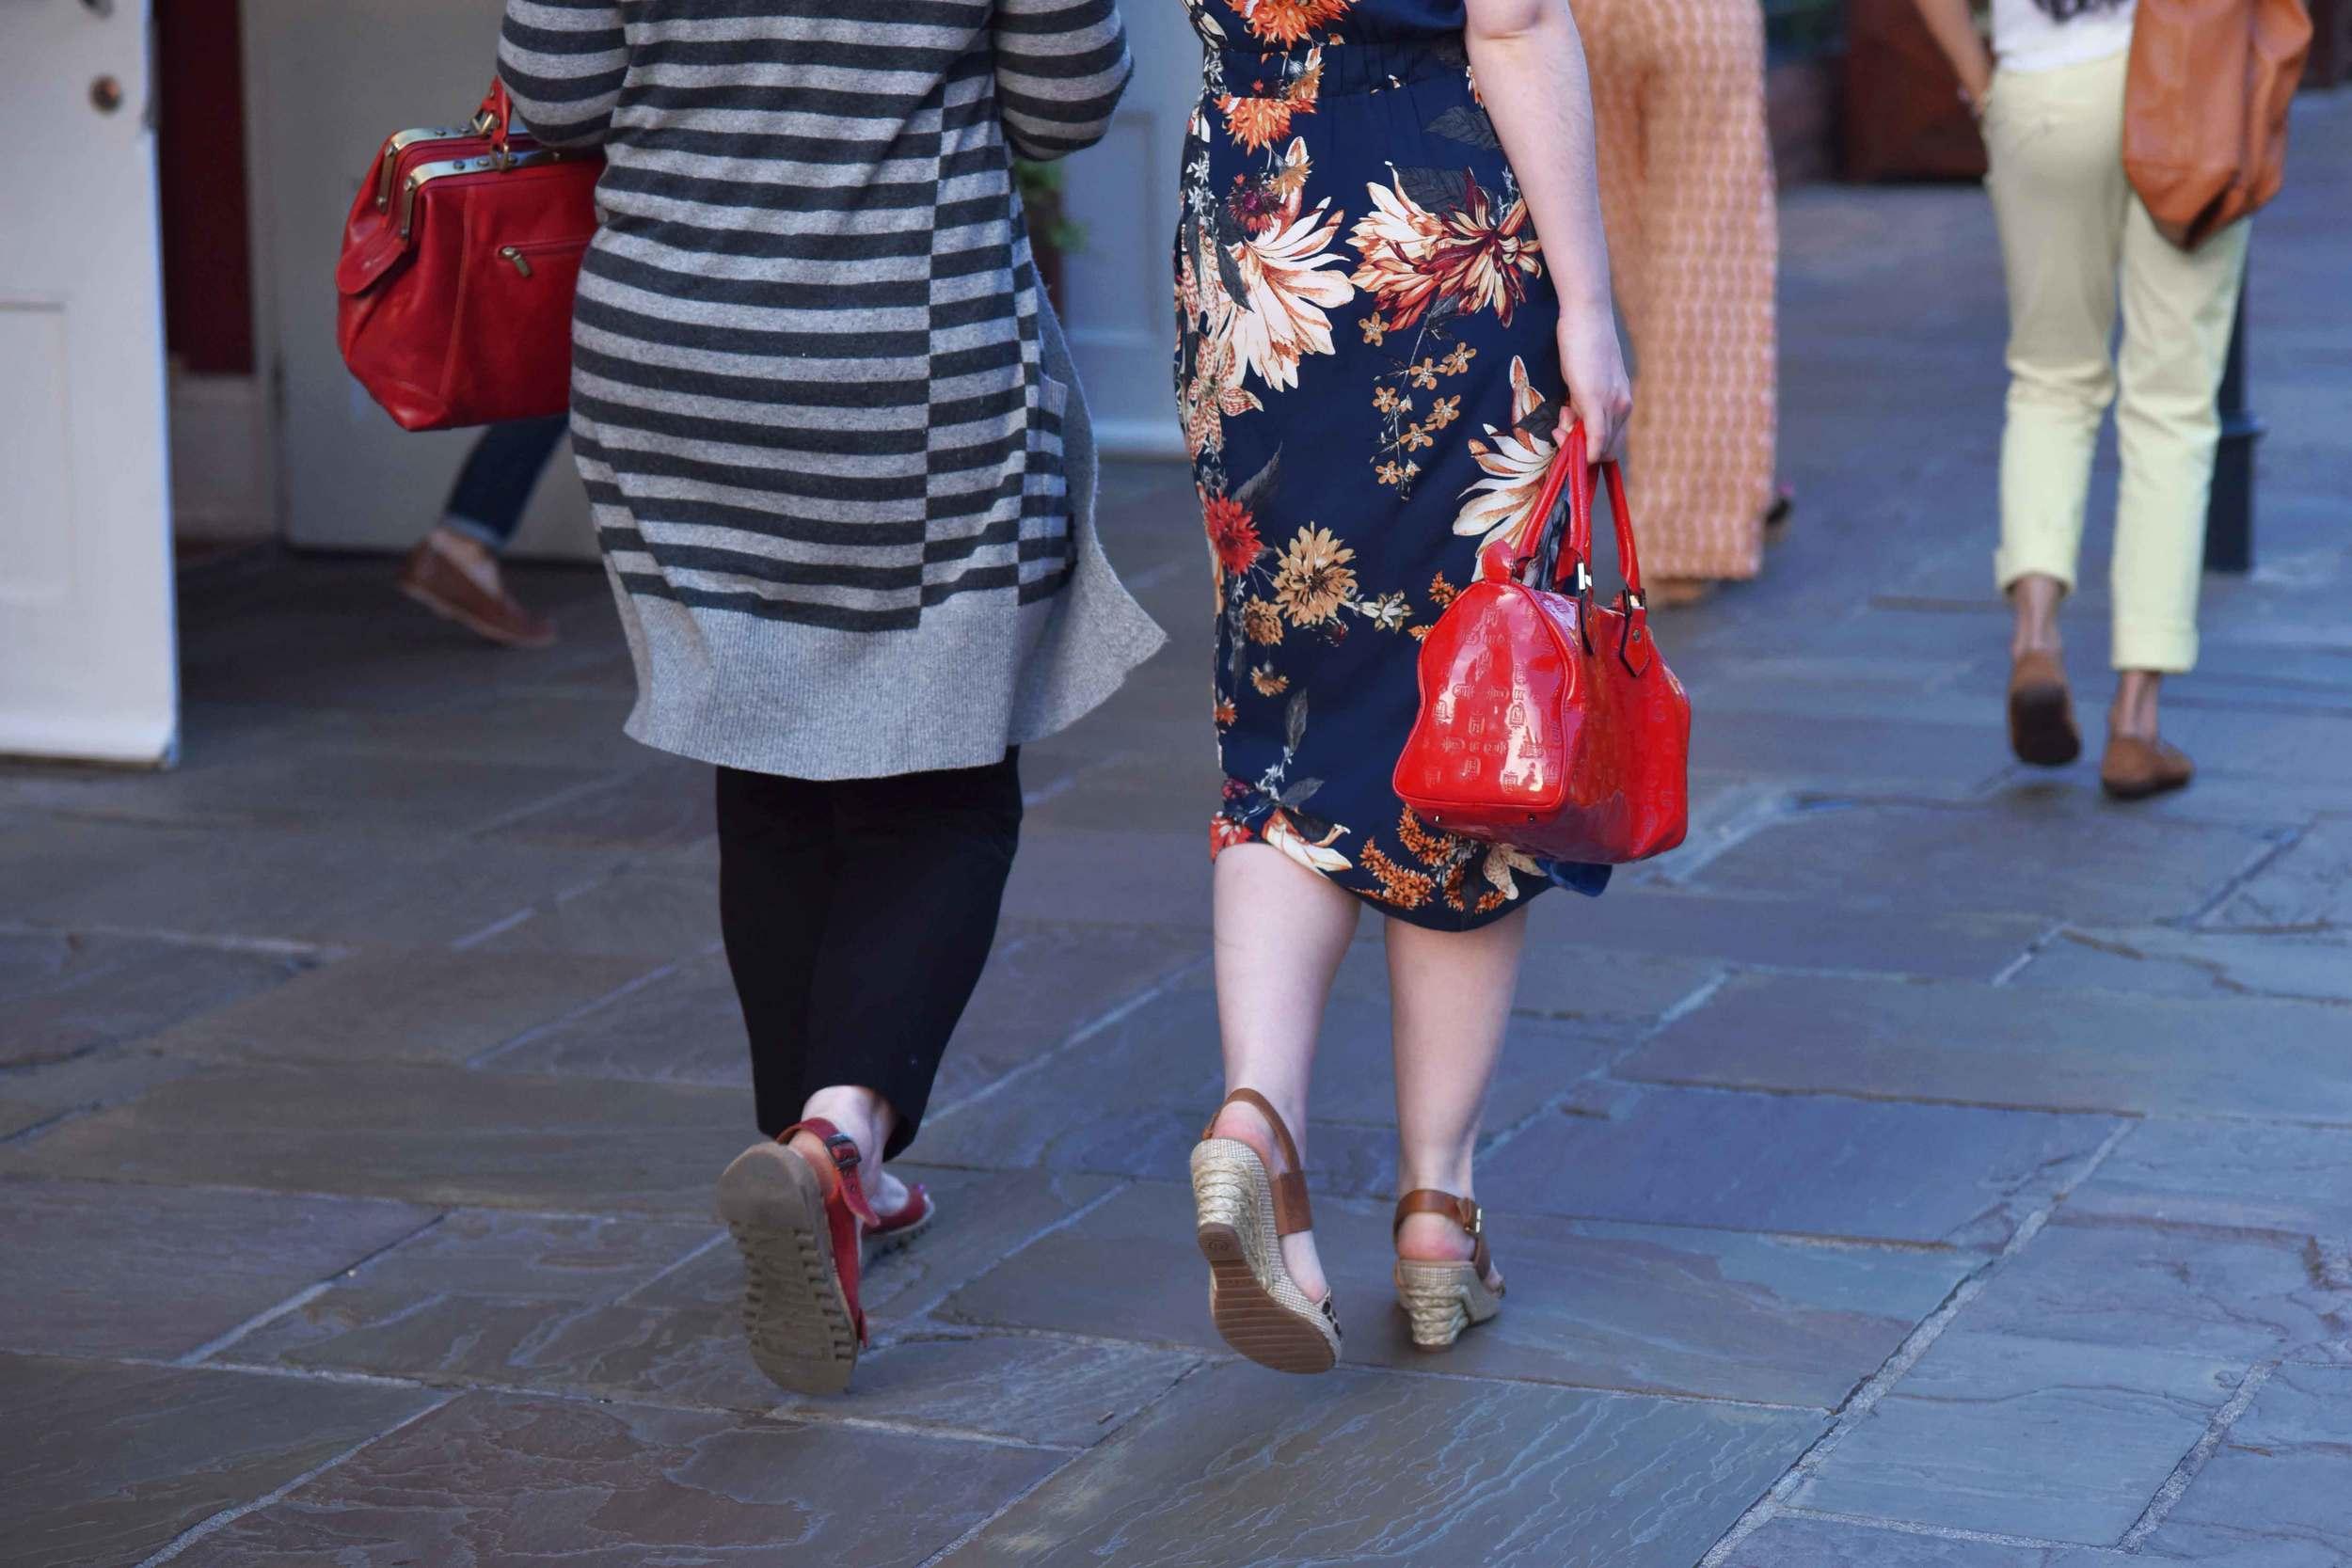 Spotted! Red bag is in vogue! Bicester village, designer shopping outlet near London, UK. Image©sourcingstyle.com